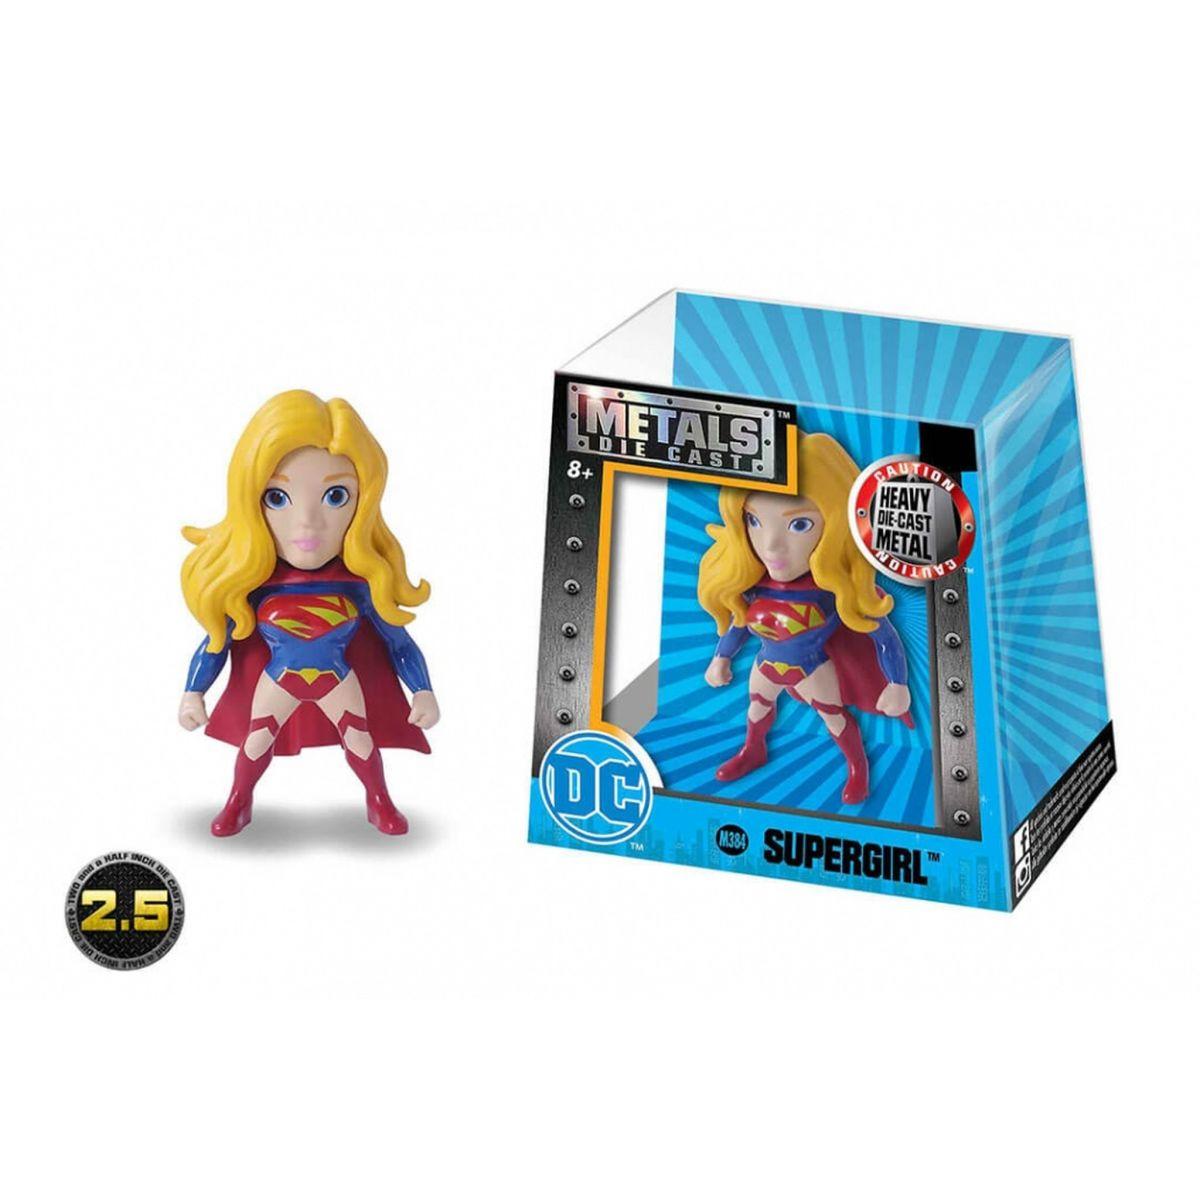 Metals Die Cast (Mini): Supergirl (M384) Uniforme Clássico - DTC